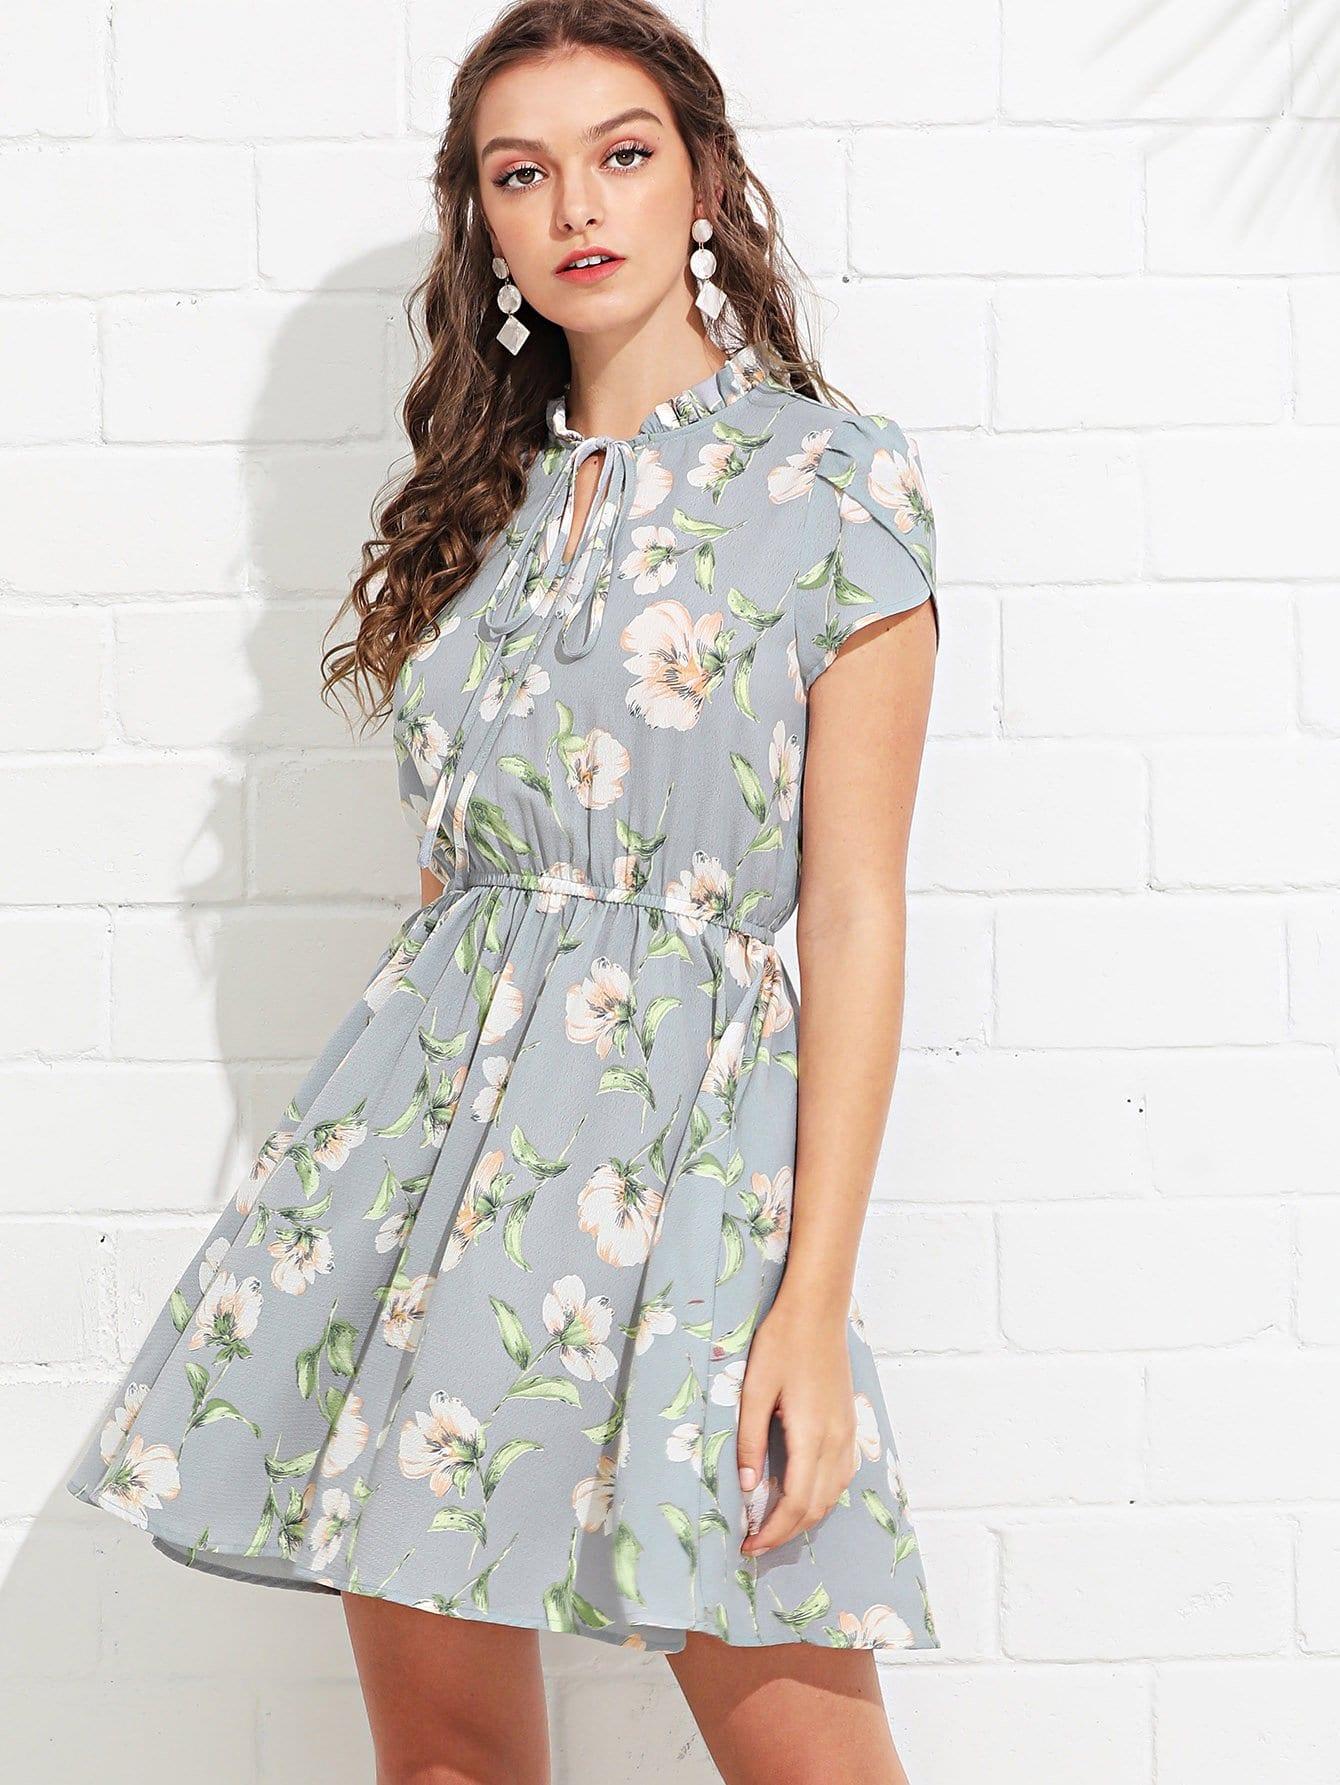 Tie Neck Elastic Waist Frilled Floral Dress tie neck elastic waist glitter dress